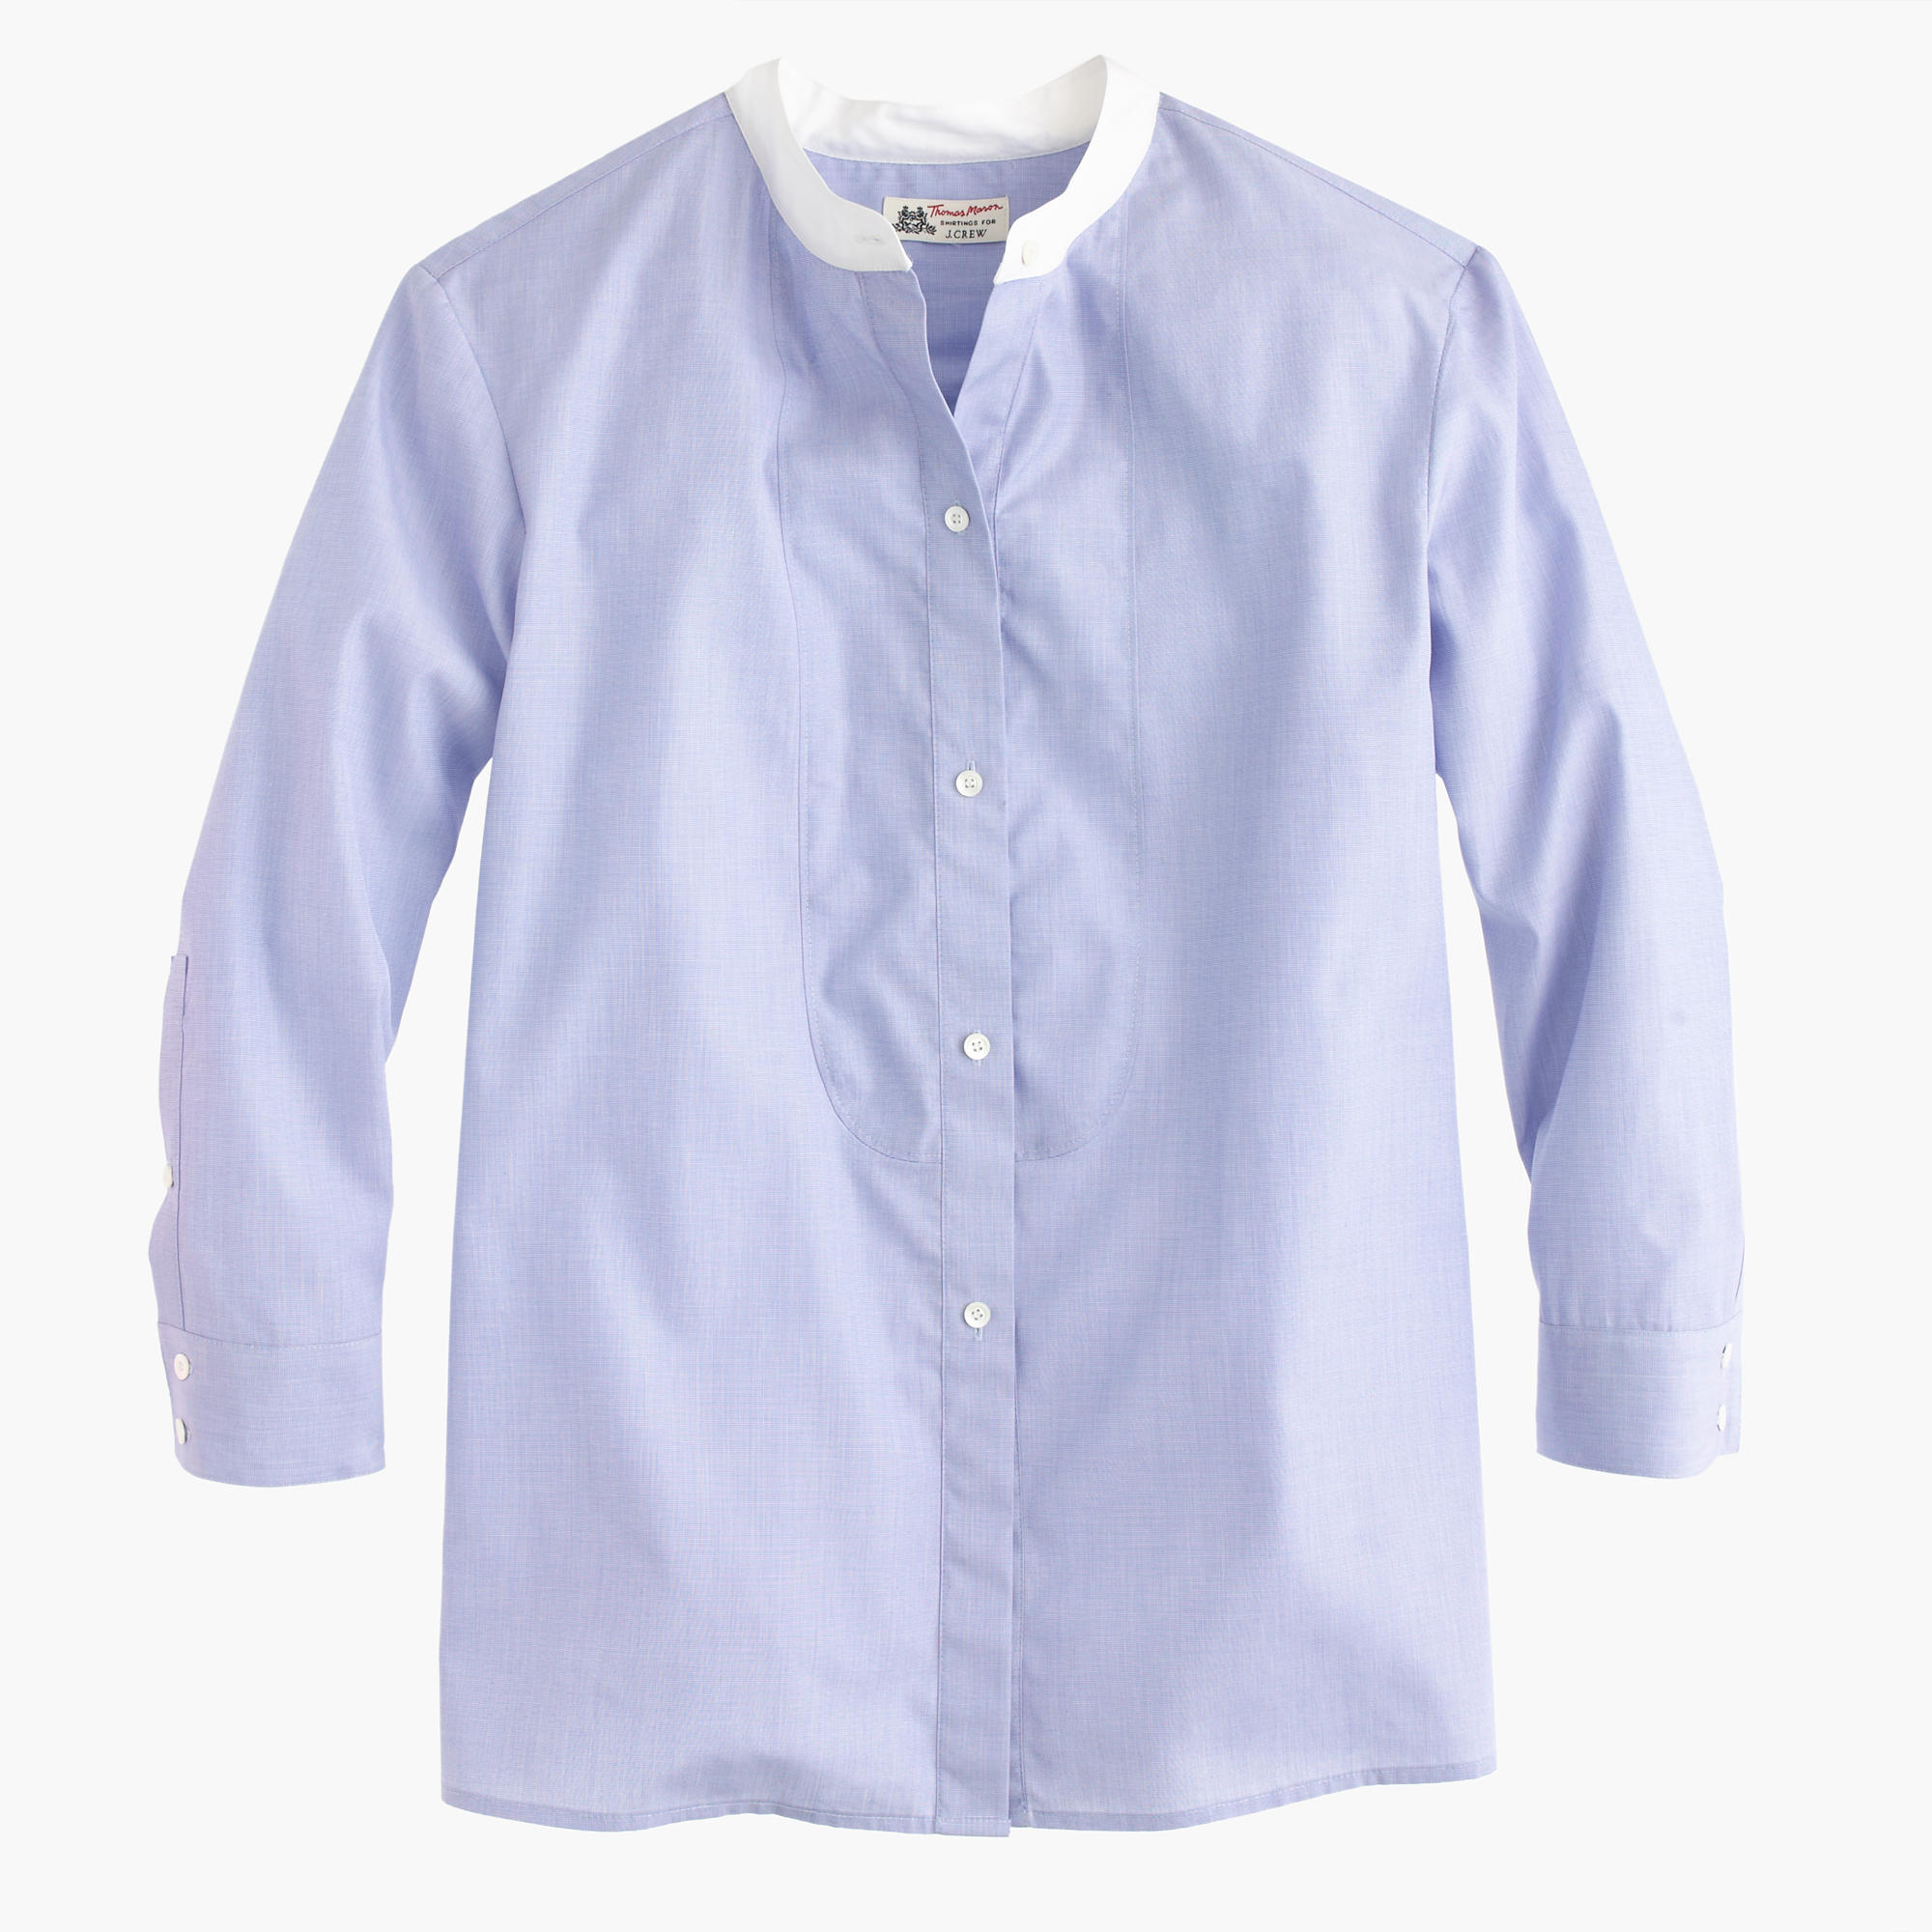 thomas mason for j crew collarless shirt   women u0026 39 s shirts